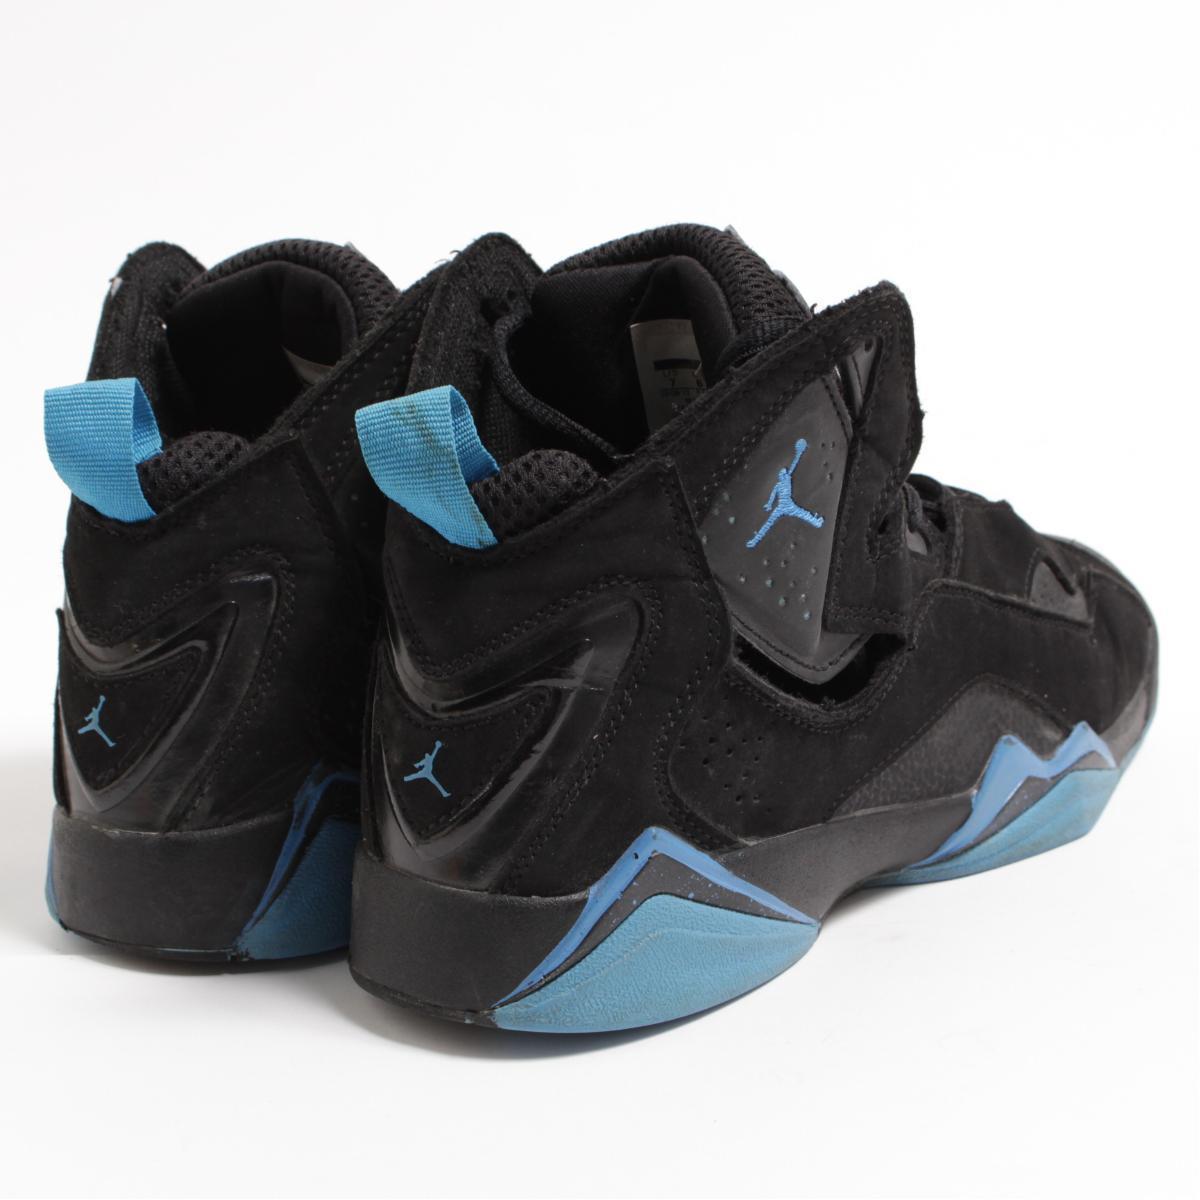 official photos a1d5a e7da0 Nike NIKE AIR JORDAN 7 TRUE FLIGHT sneakers US7 men 25.0cm /boo1950